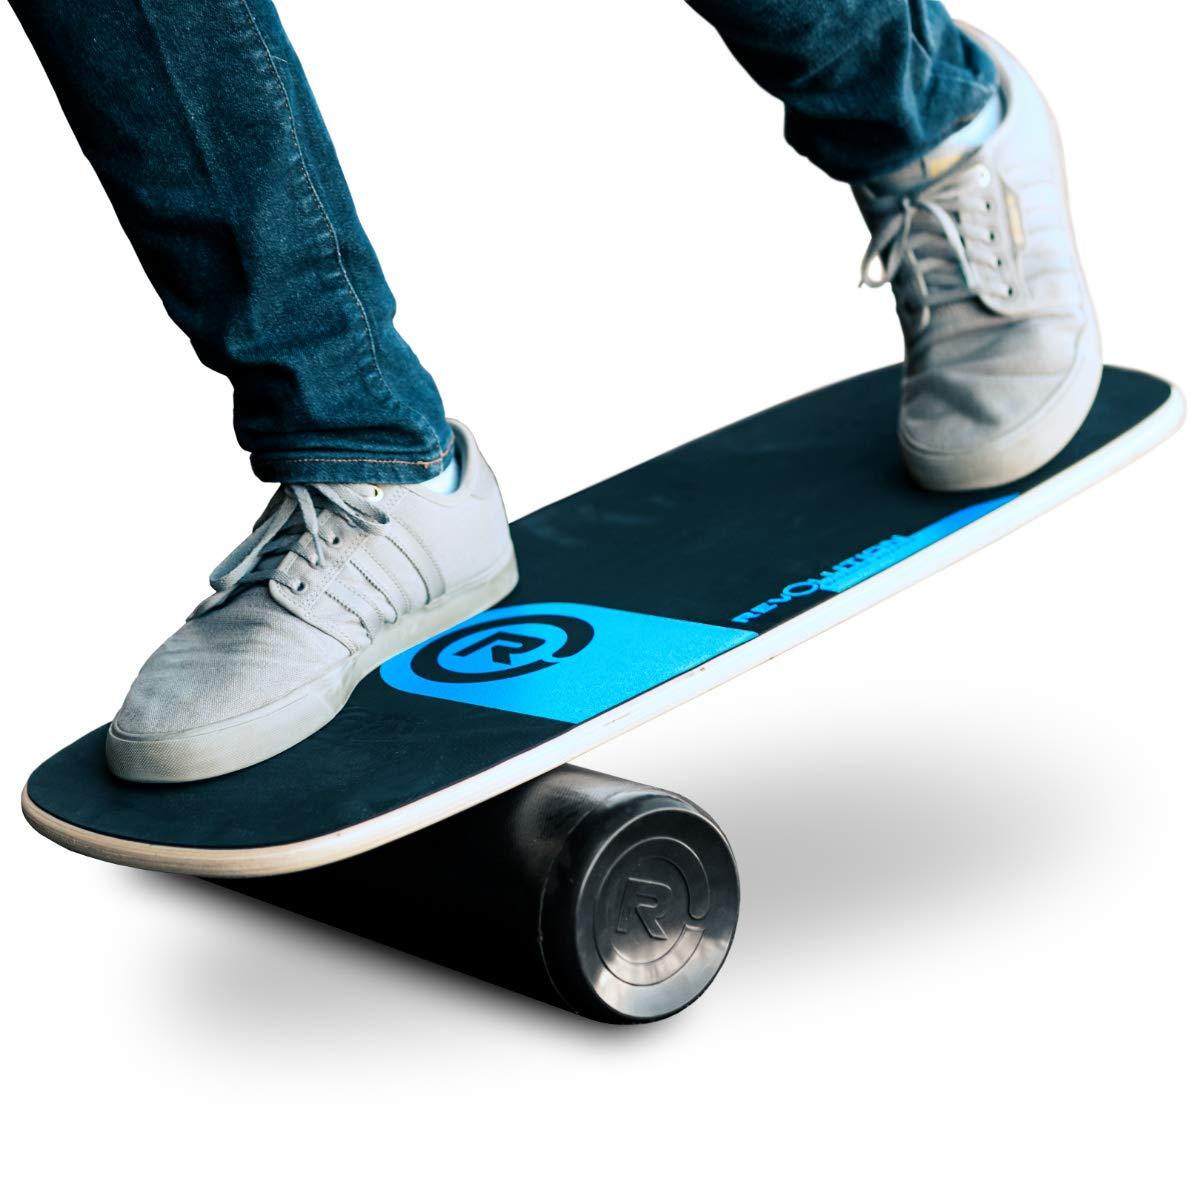 Revolution 101 Balance Board Trainer (Blue) by Revolution Balance Boards (Image #1)